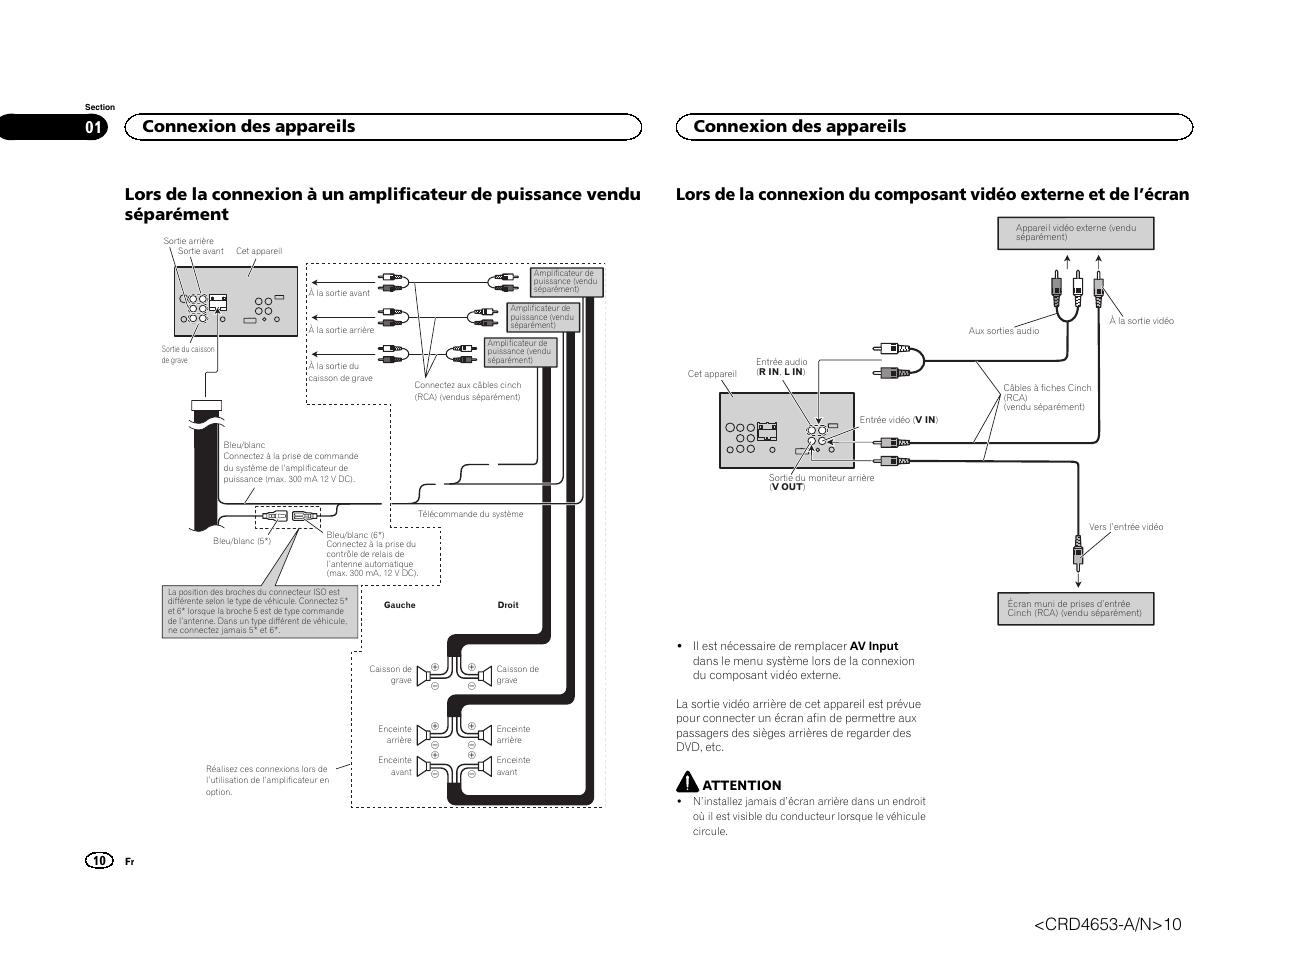 Connexion des appareils | Pioneer AVH-X1500DVD User Manual | Page 10 / 40 |  Original modeManuals Directory